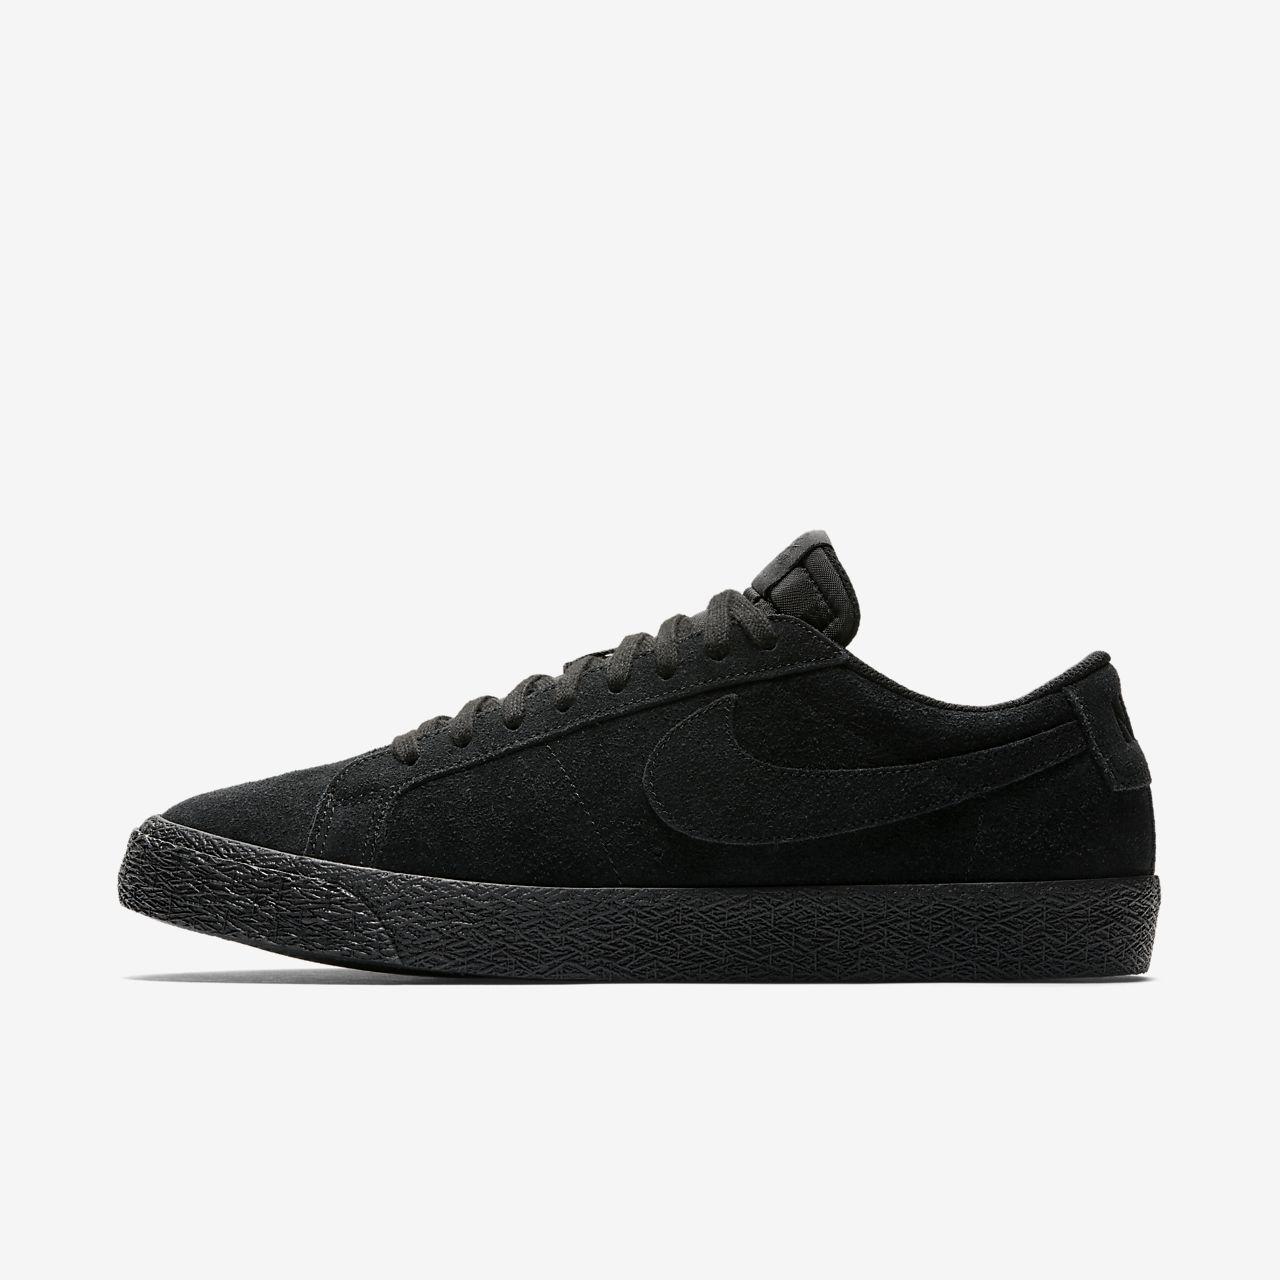 reputable site ad8e6 e45ba ... Nike SB Blazer Zoom Low Mens Skateboarding Shoe